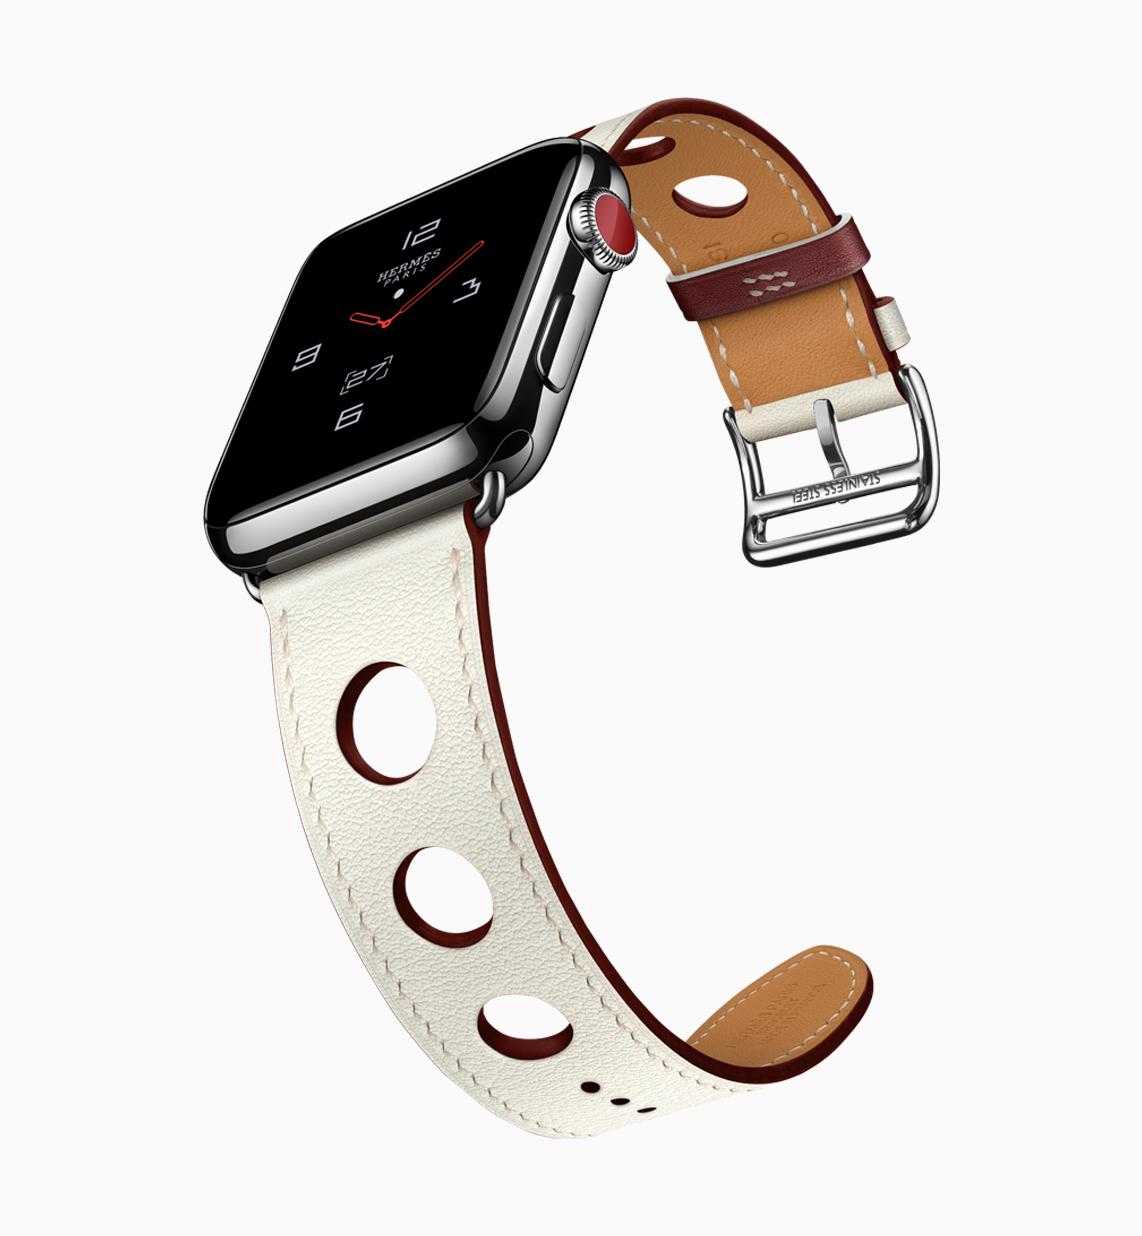 Apple Watch Series 3 Hermes single tour